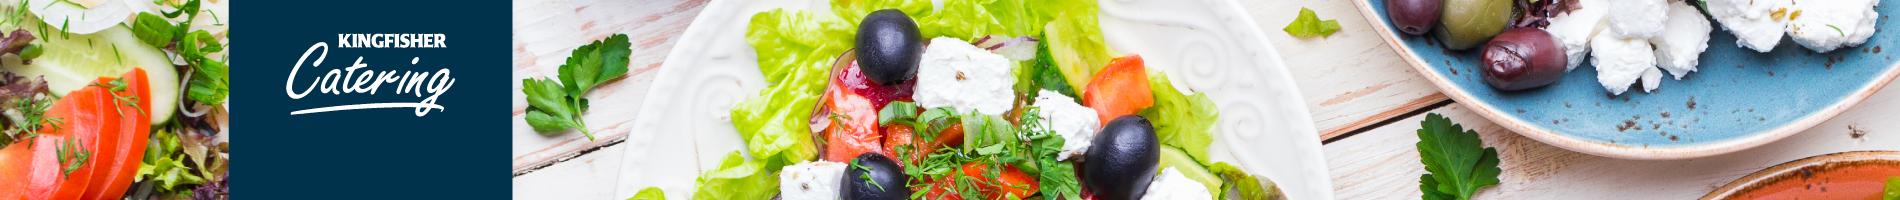 Premium Catering Products